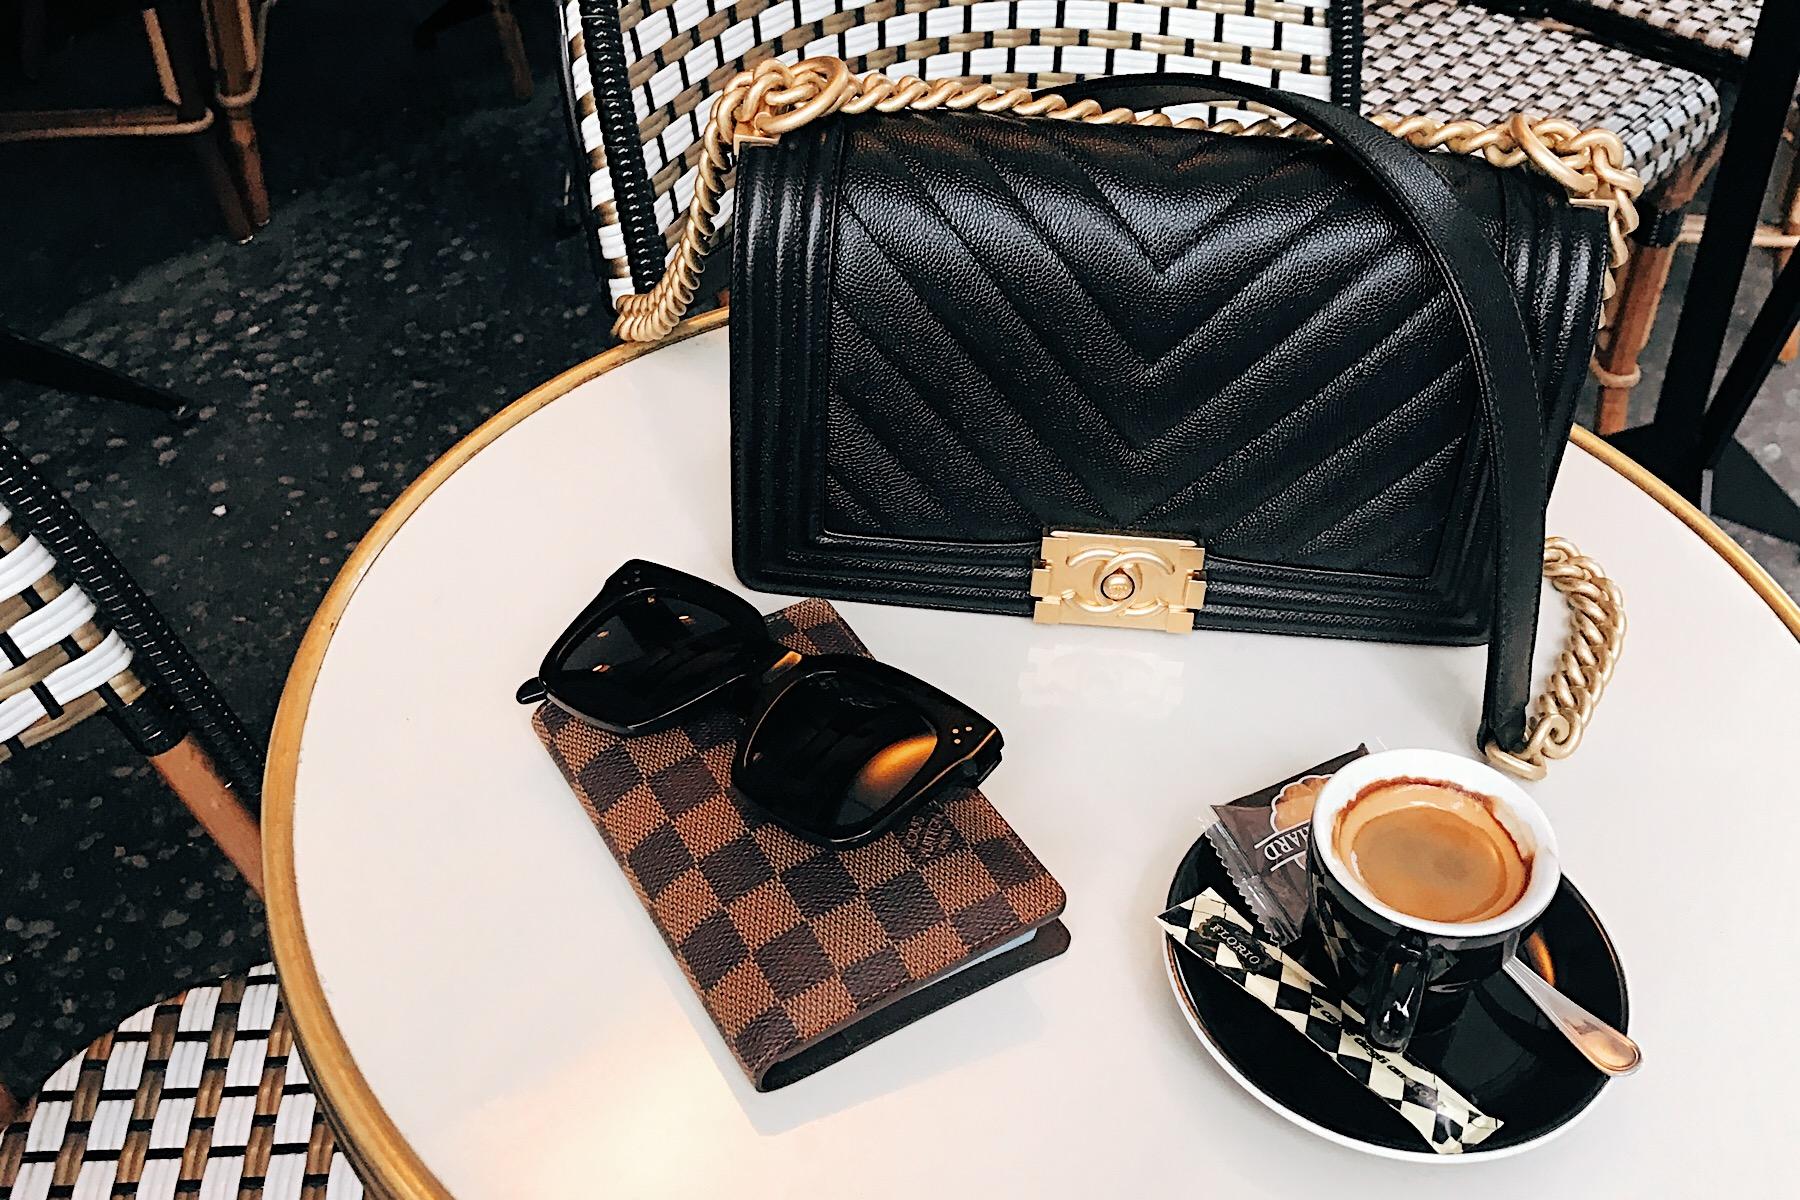 Chanel Black Boy Bag Paris Cafe